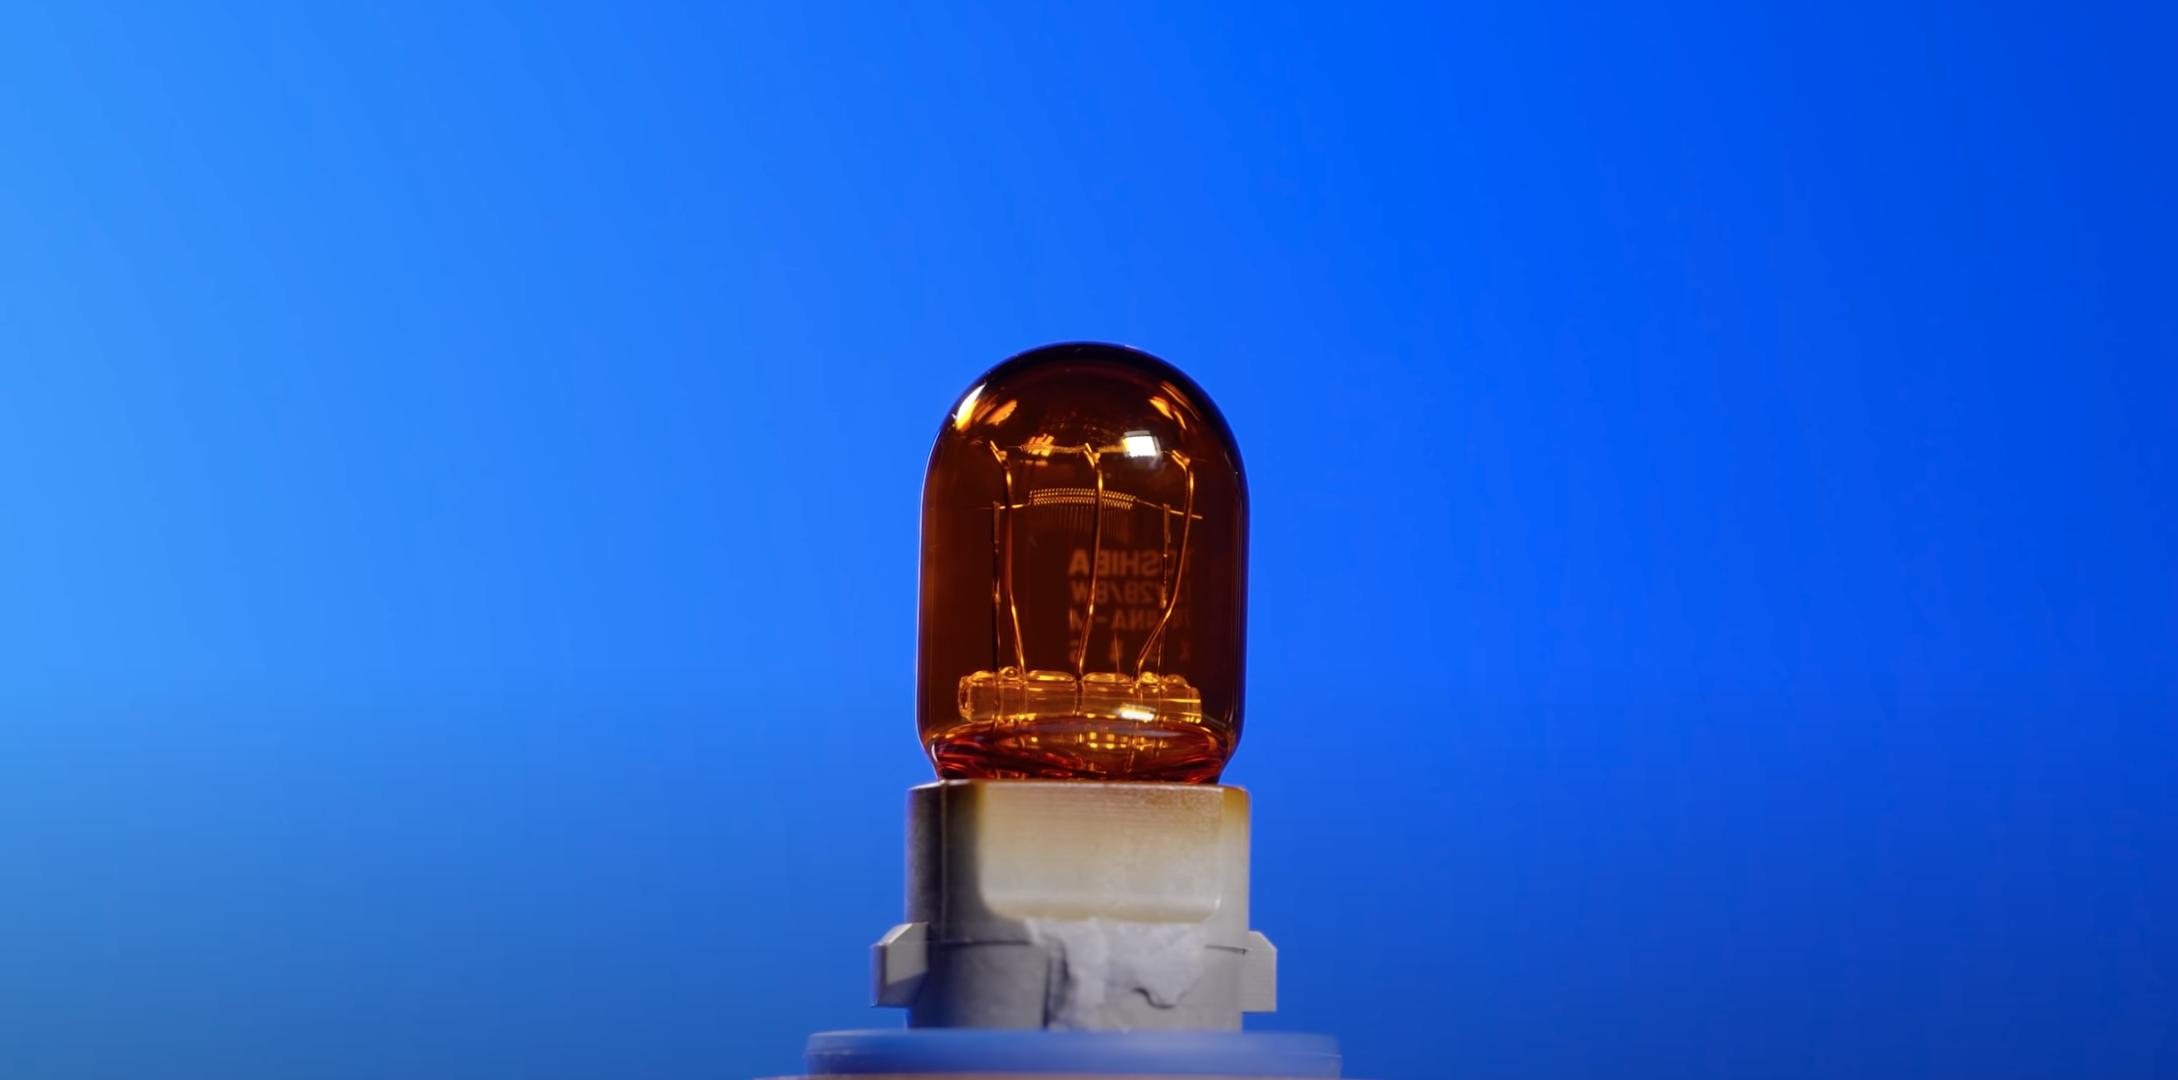 The Ultra i-LED By GTR Lighting | The Most Innovative LED Turn Signal Bulbs